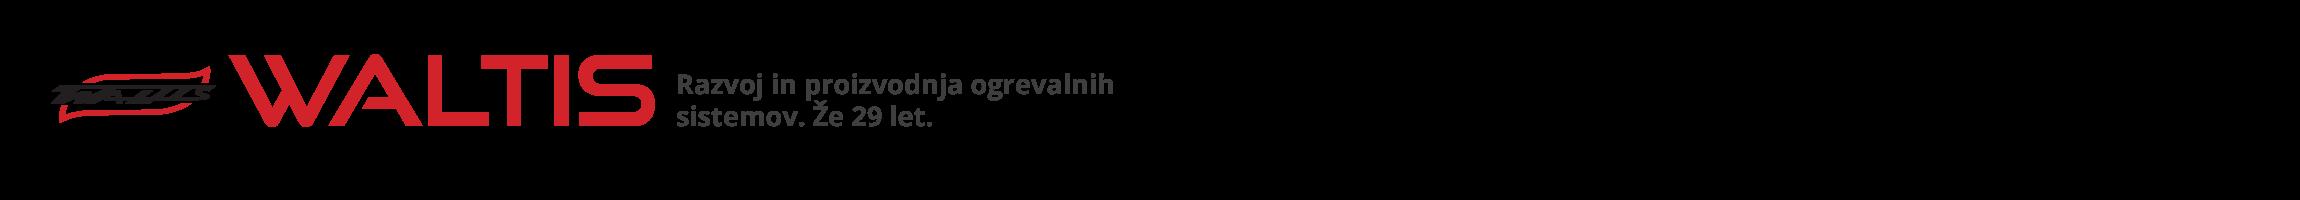 Waltis – Ogrevalni Sistemi | V stiku s toplino